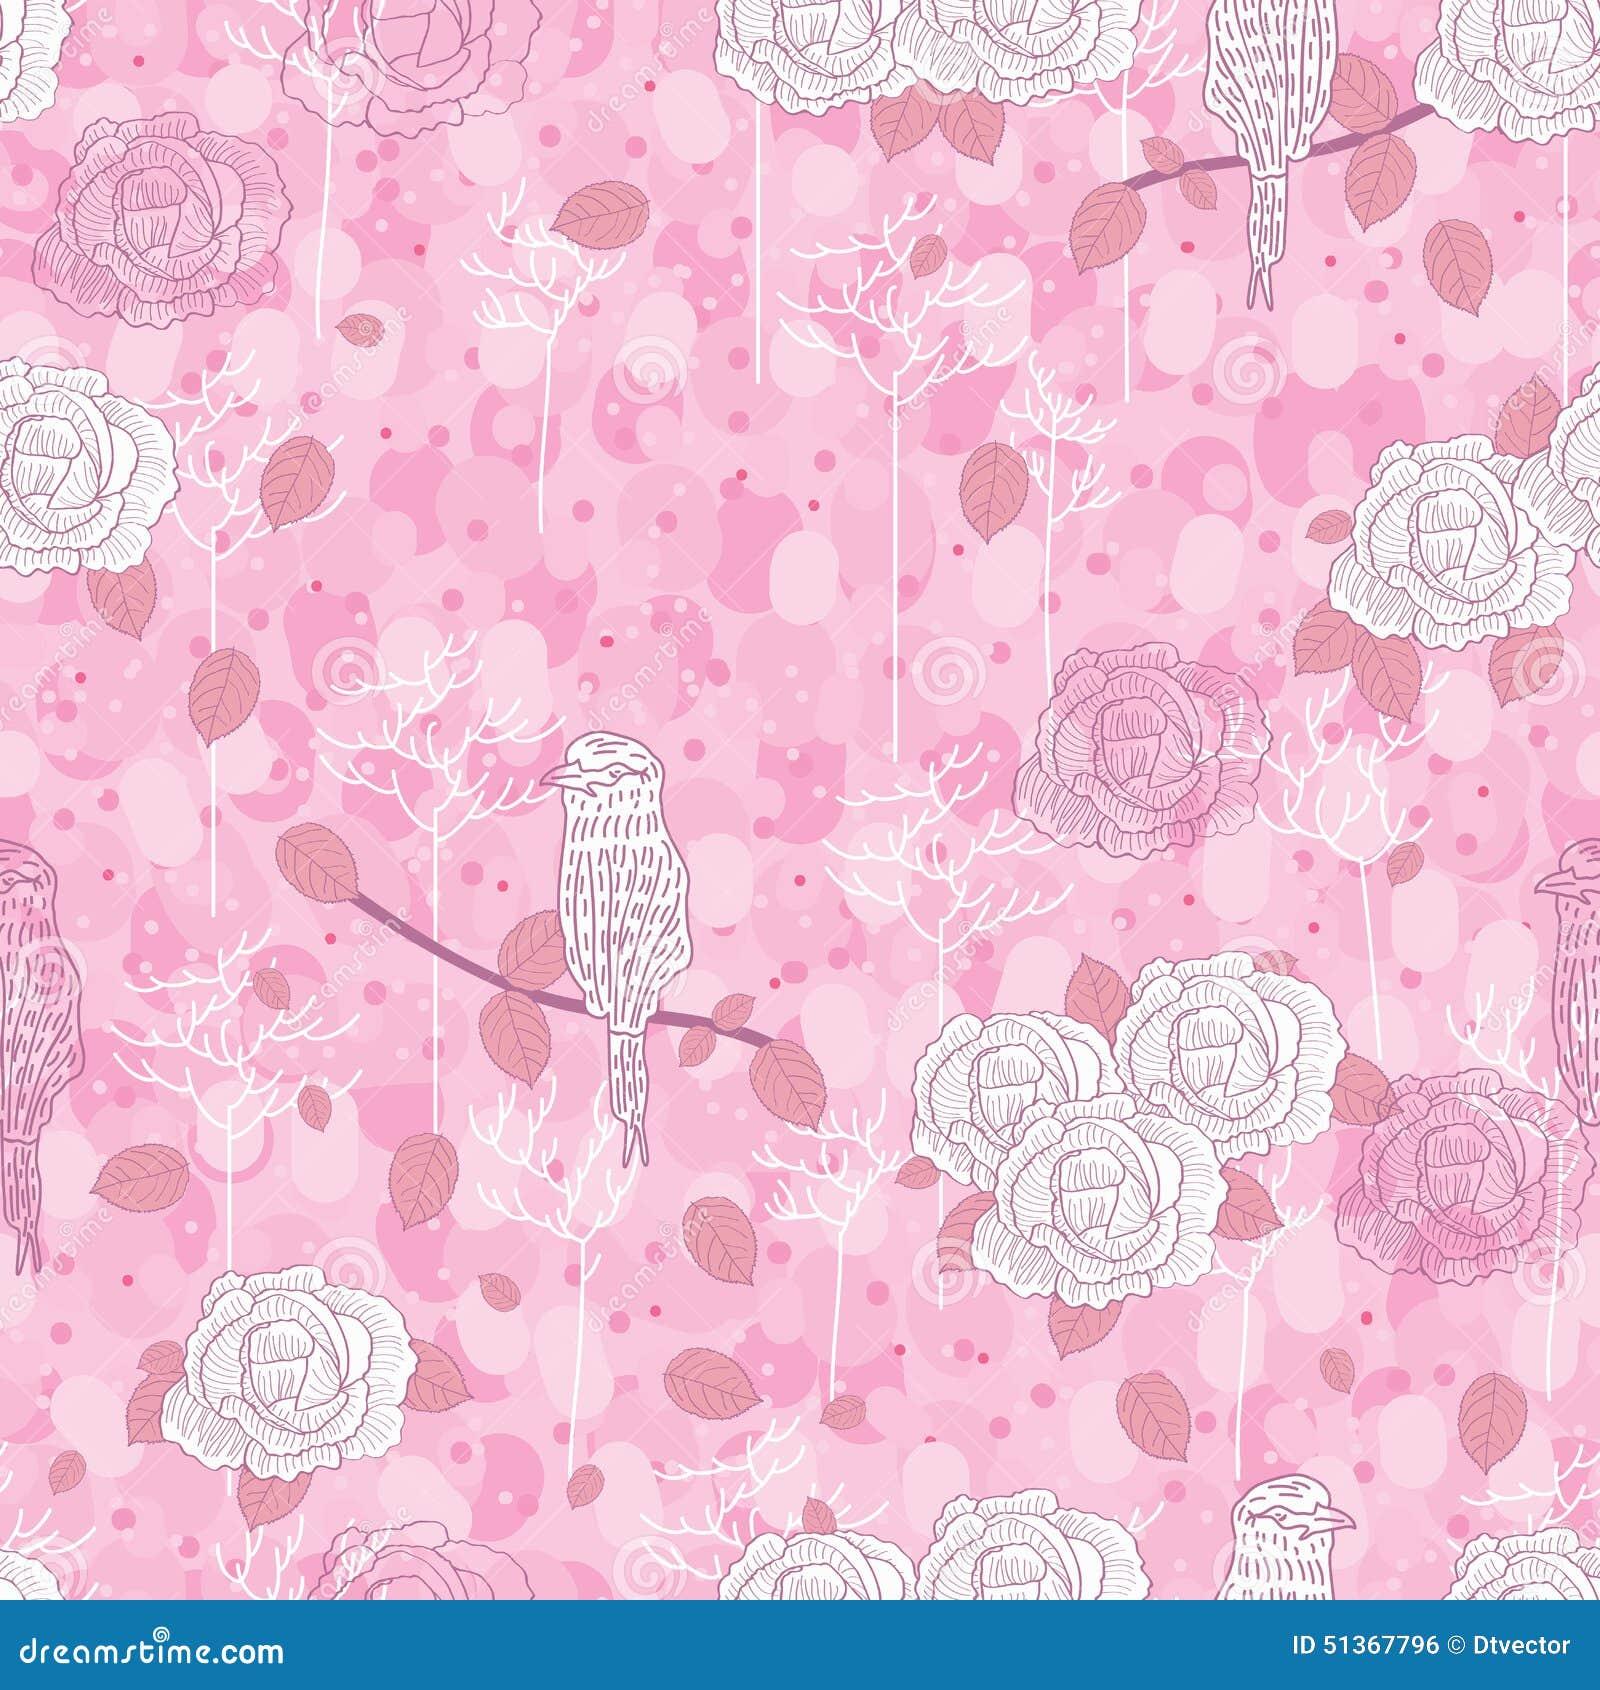 Rose bird abstract seamless pattern